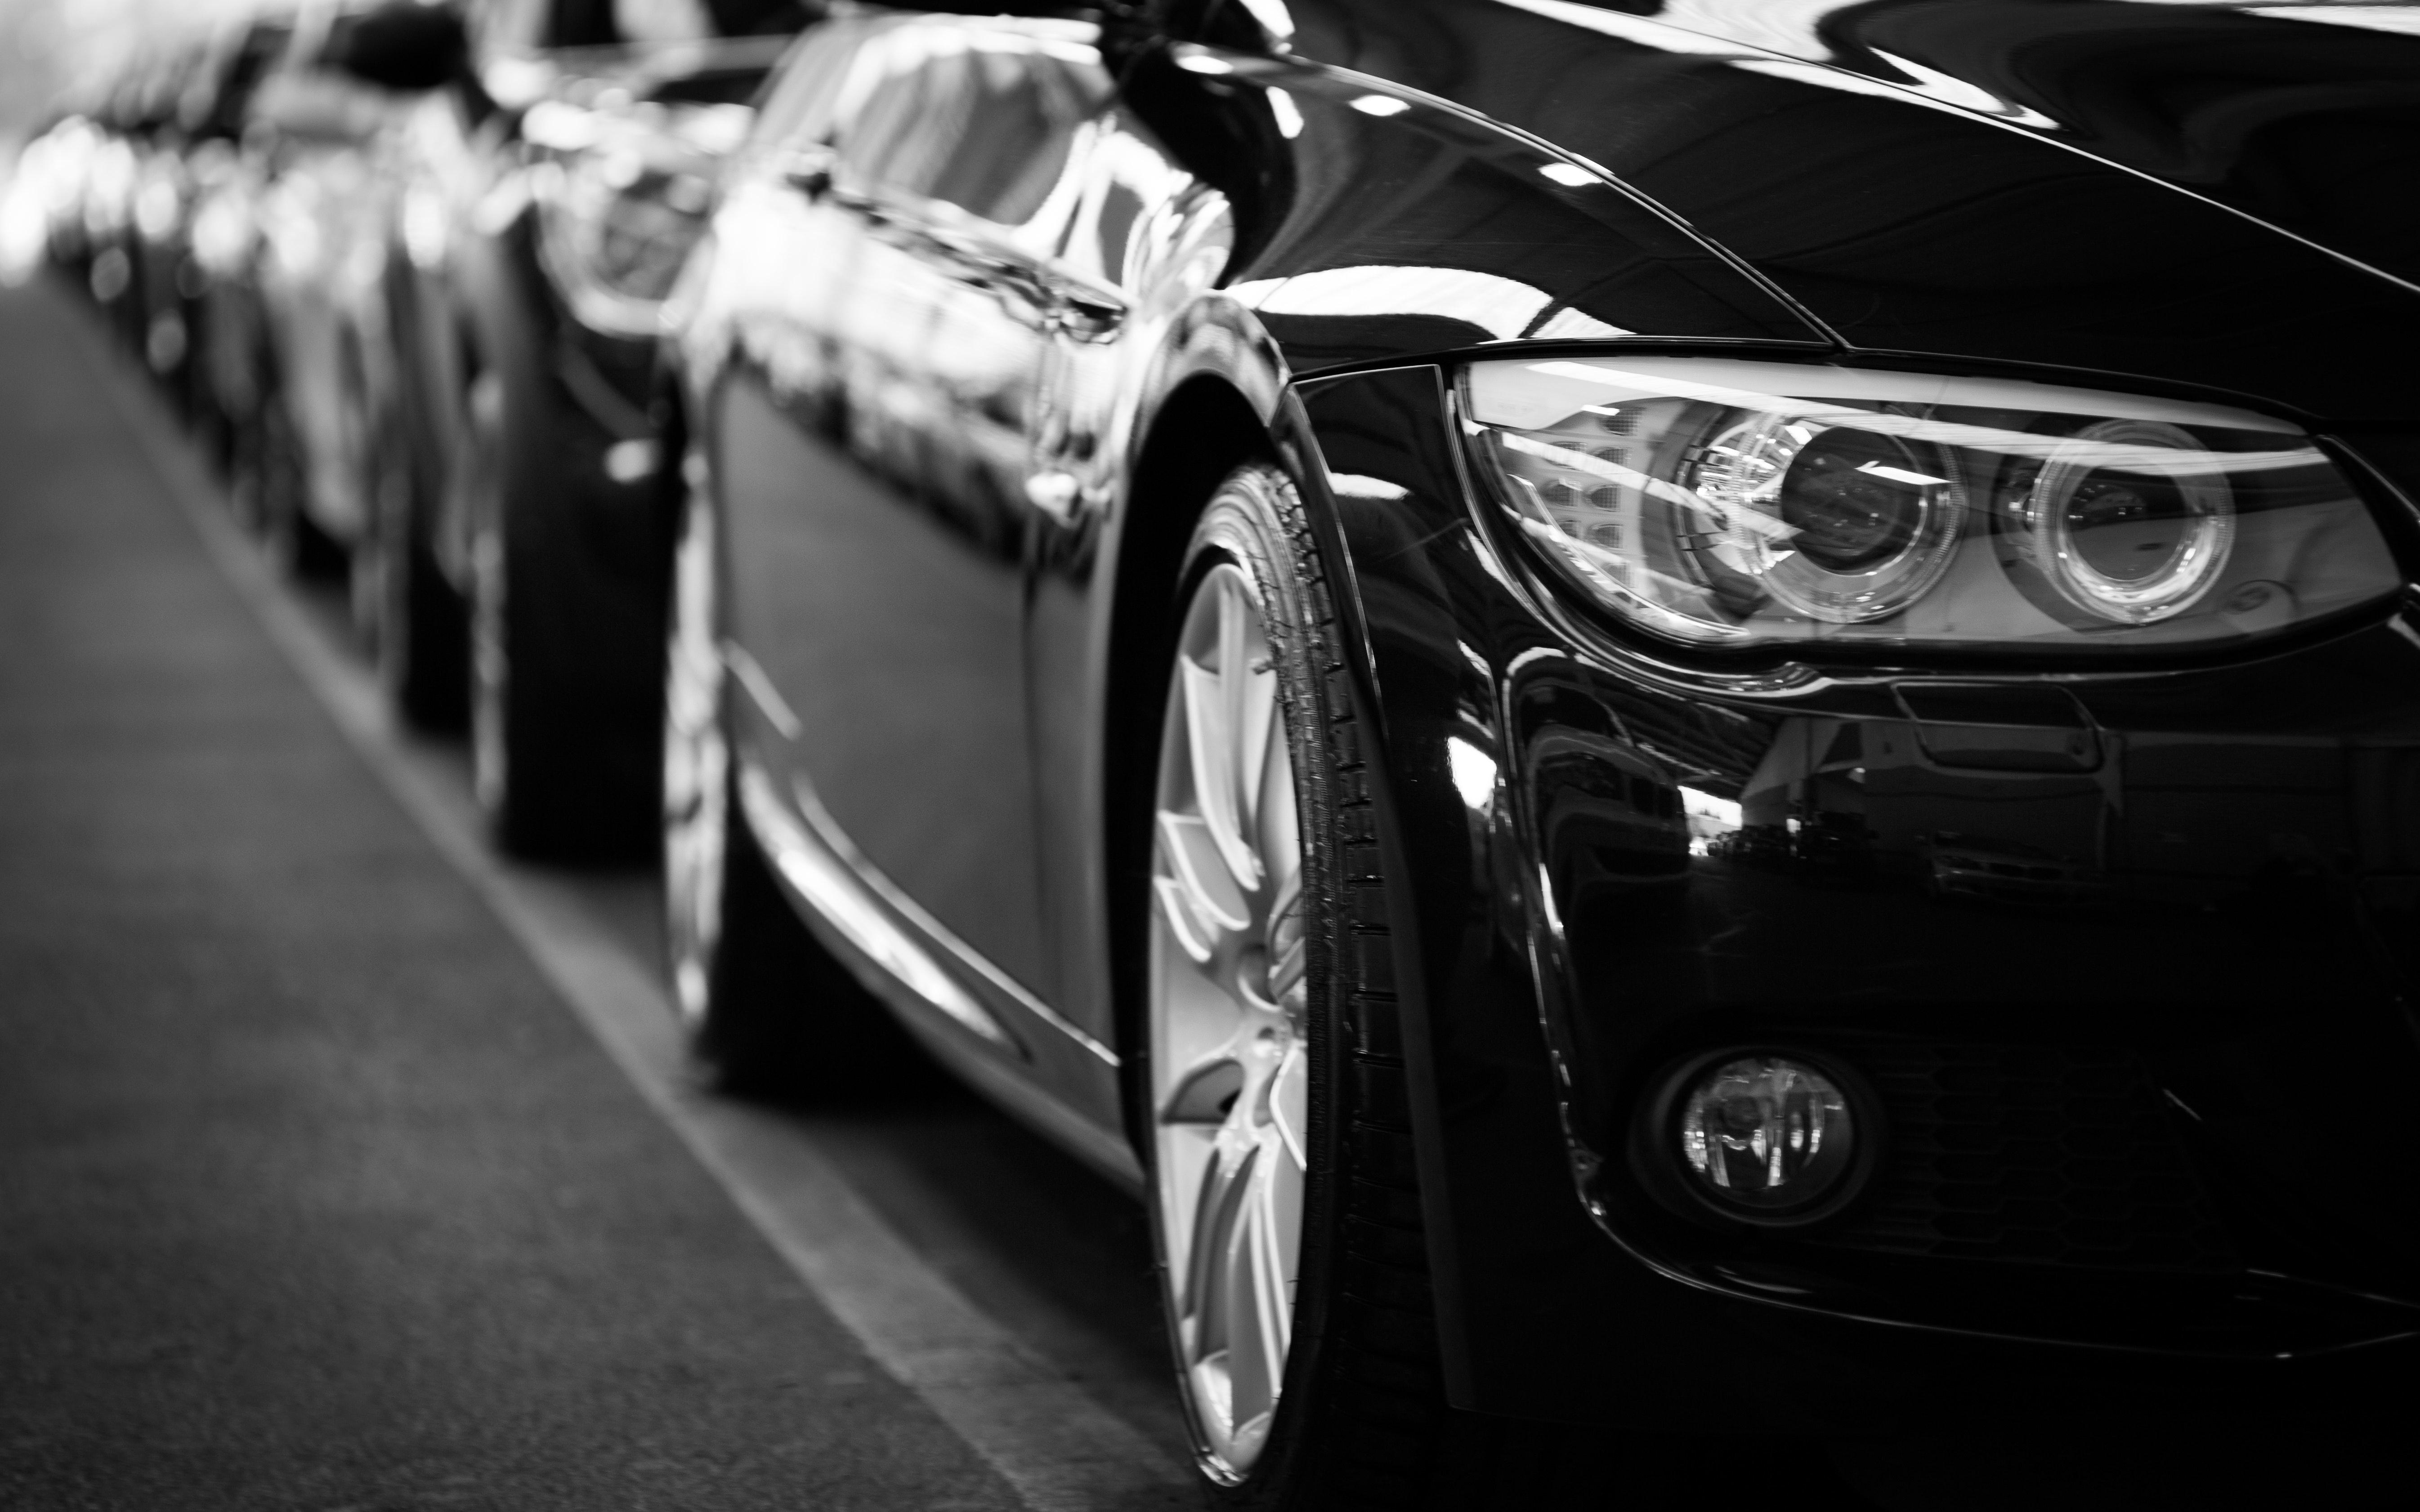 automobiles-automotives-black-and-white-70912